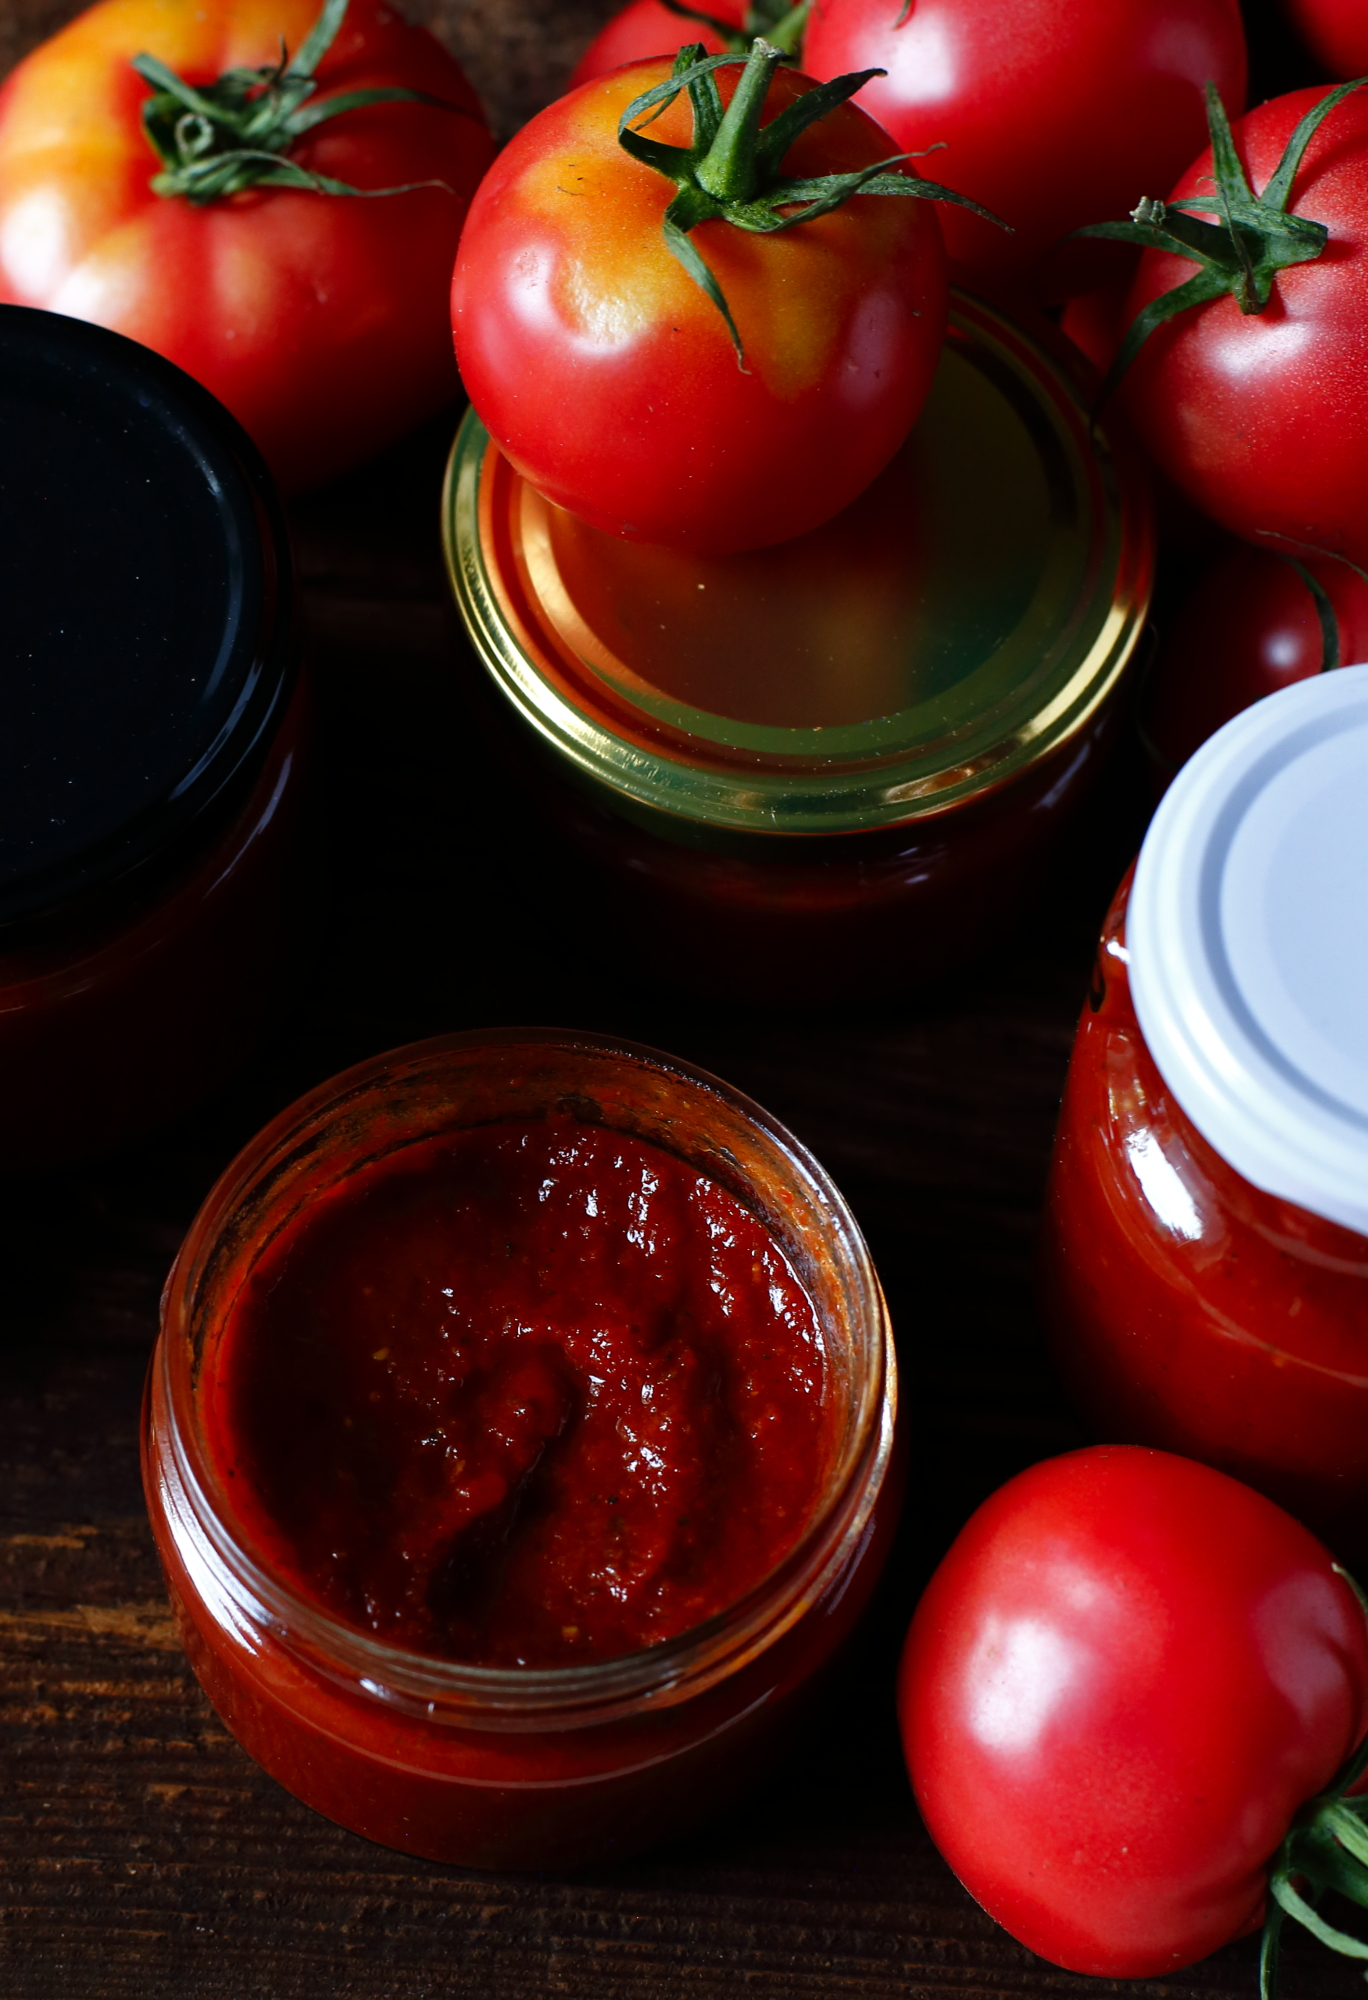 Domowy ketchup bez cukru